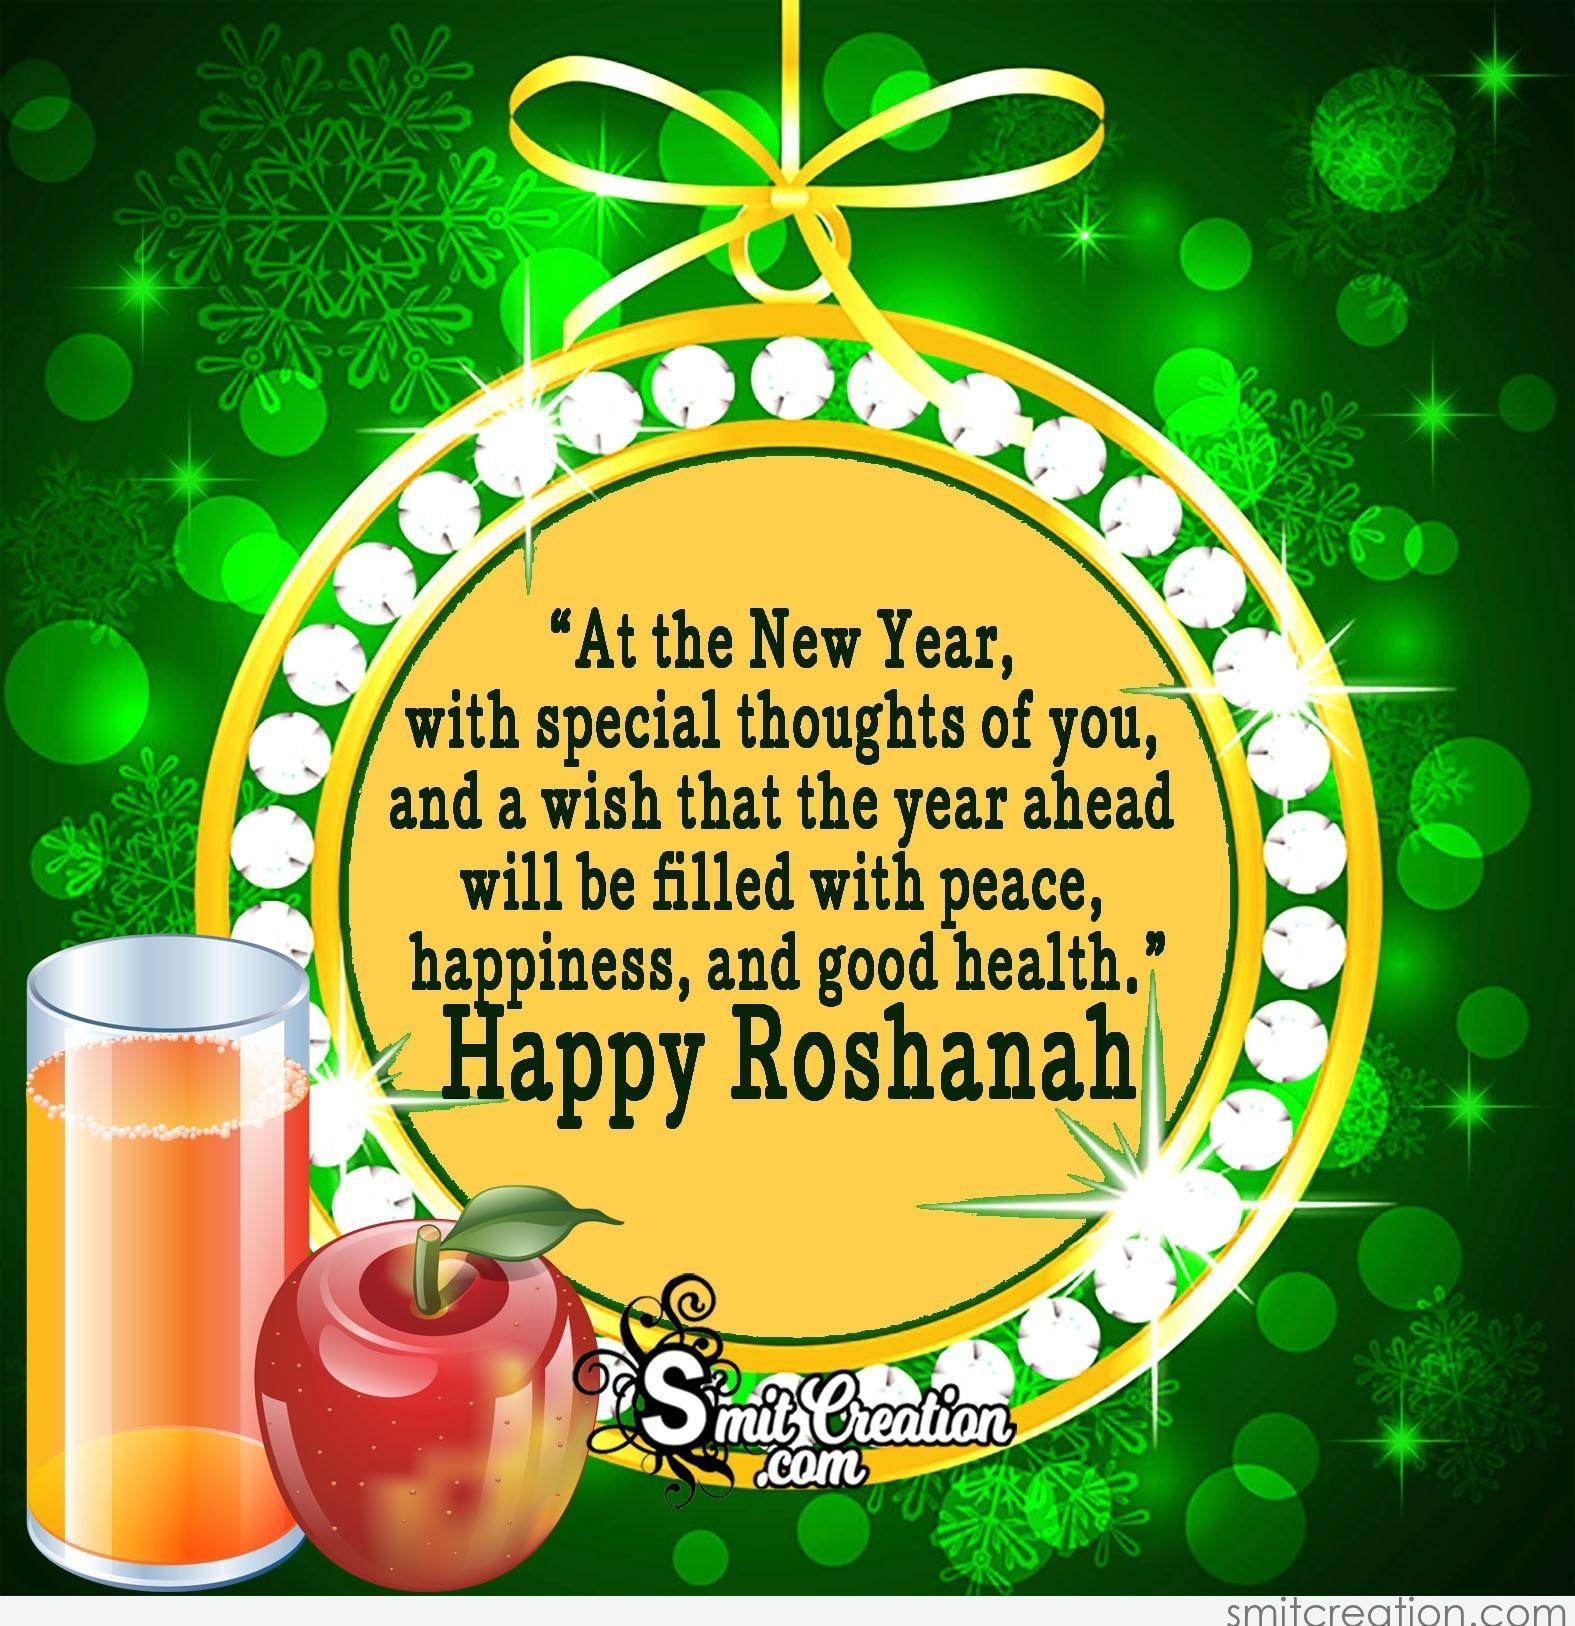 Happy Rosh Hashanah Greetings Card Smitcreation